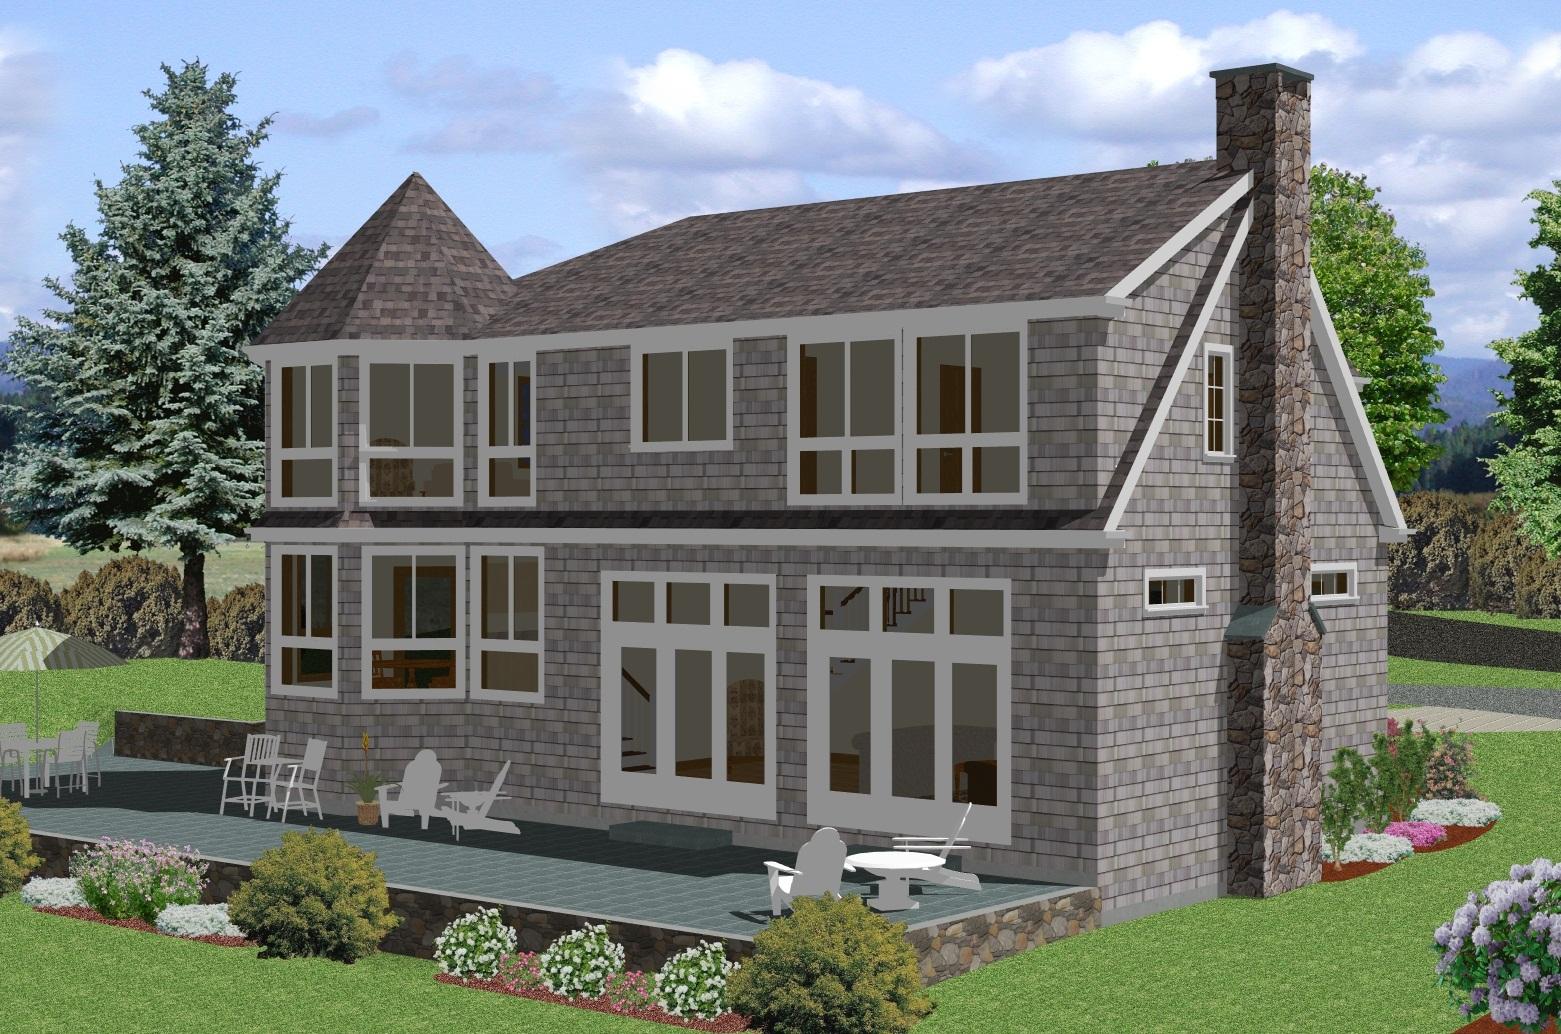 Modelo de vivienda americana tradicional atras for Modelos de viviendas